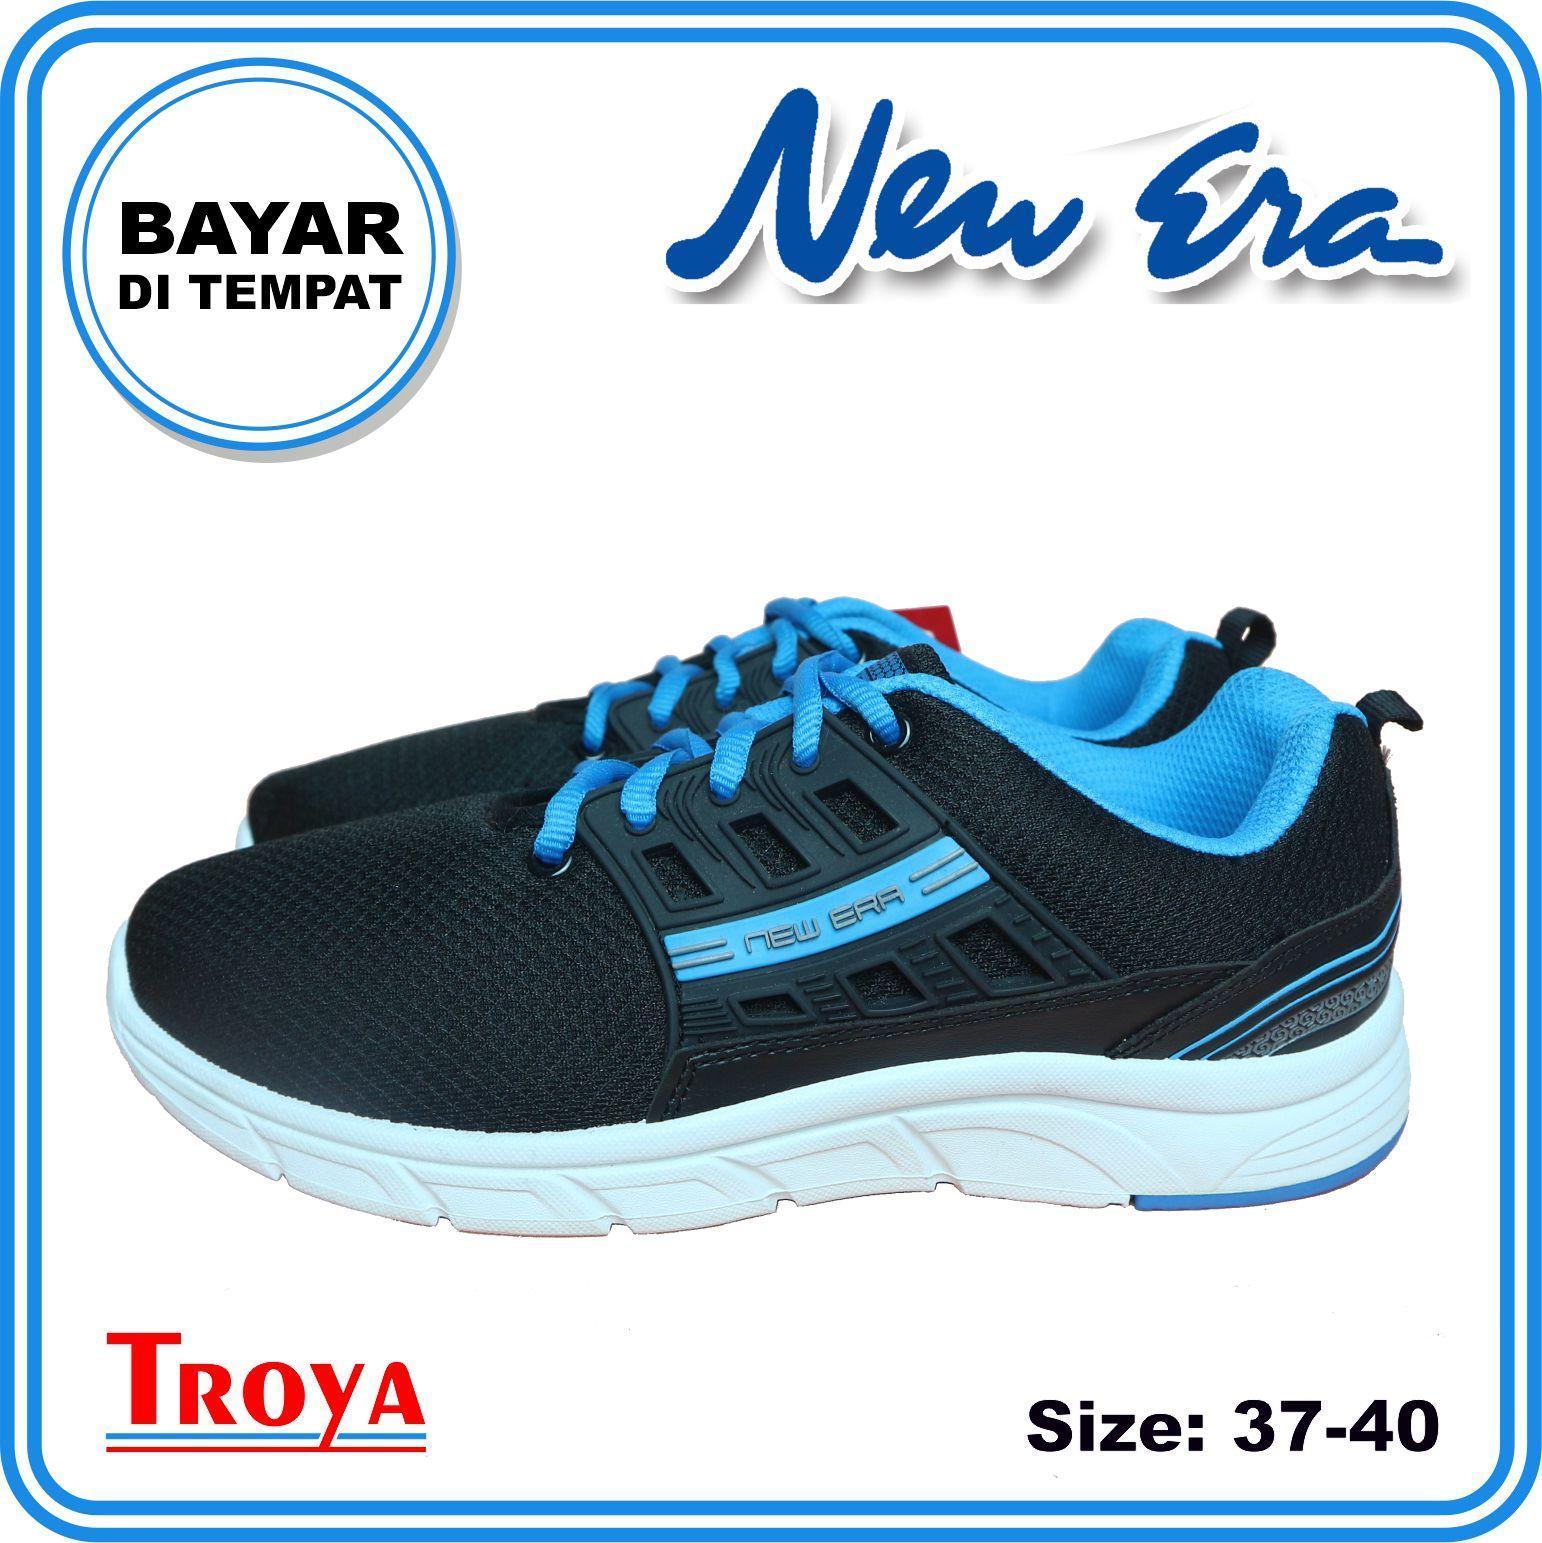 troya – new era sepatu wanita olahraga aiko 39-40 hitam biru berkualitas original  shsg / sepatu wanita fashion / sepatu sneakers wanita / sepatu sneakers wanita - sepatu kets wanita / sepatu lari wanita / sepatuwanita troyastore